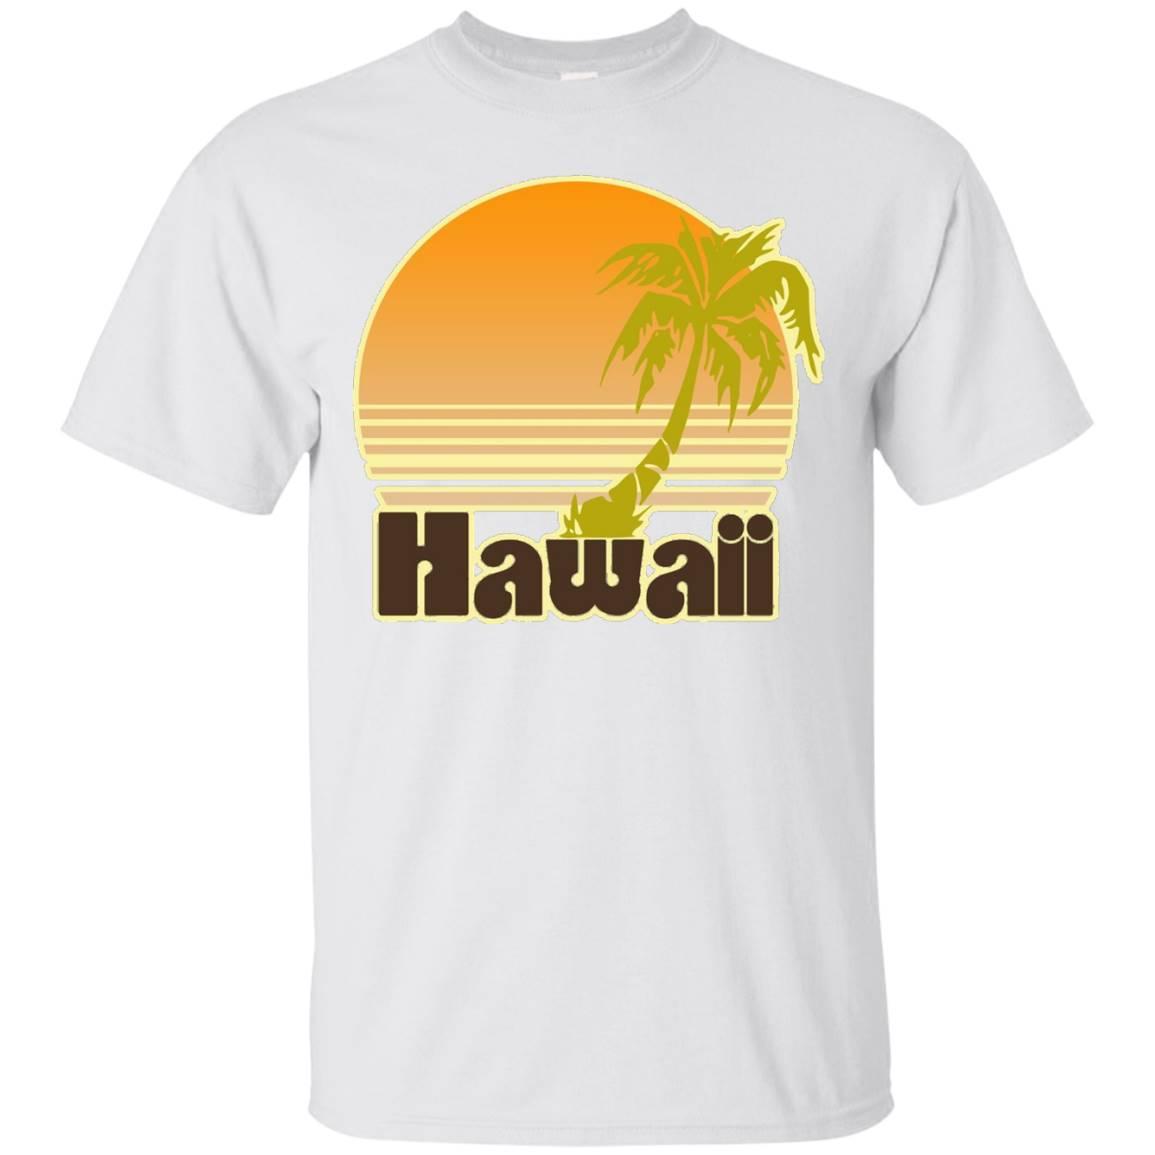 Retro Hawaii shirt for Hawaiian vacation vintage t-shirt